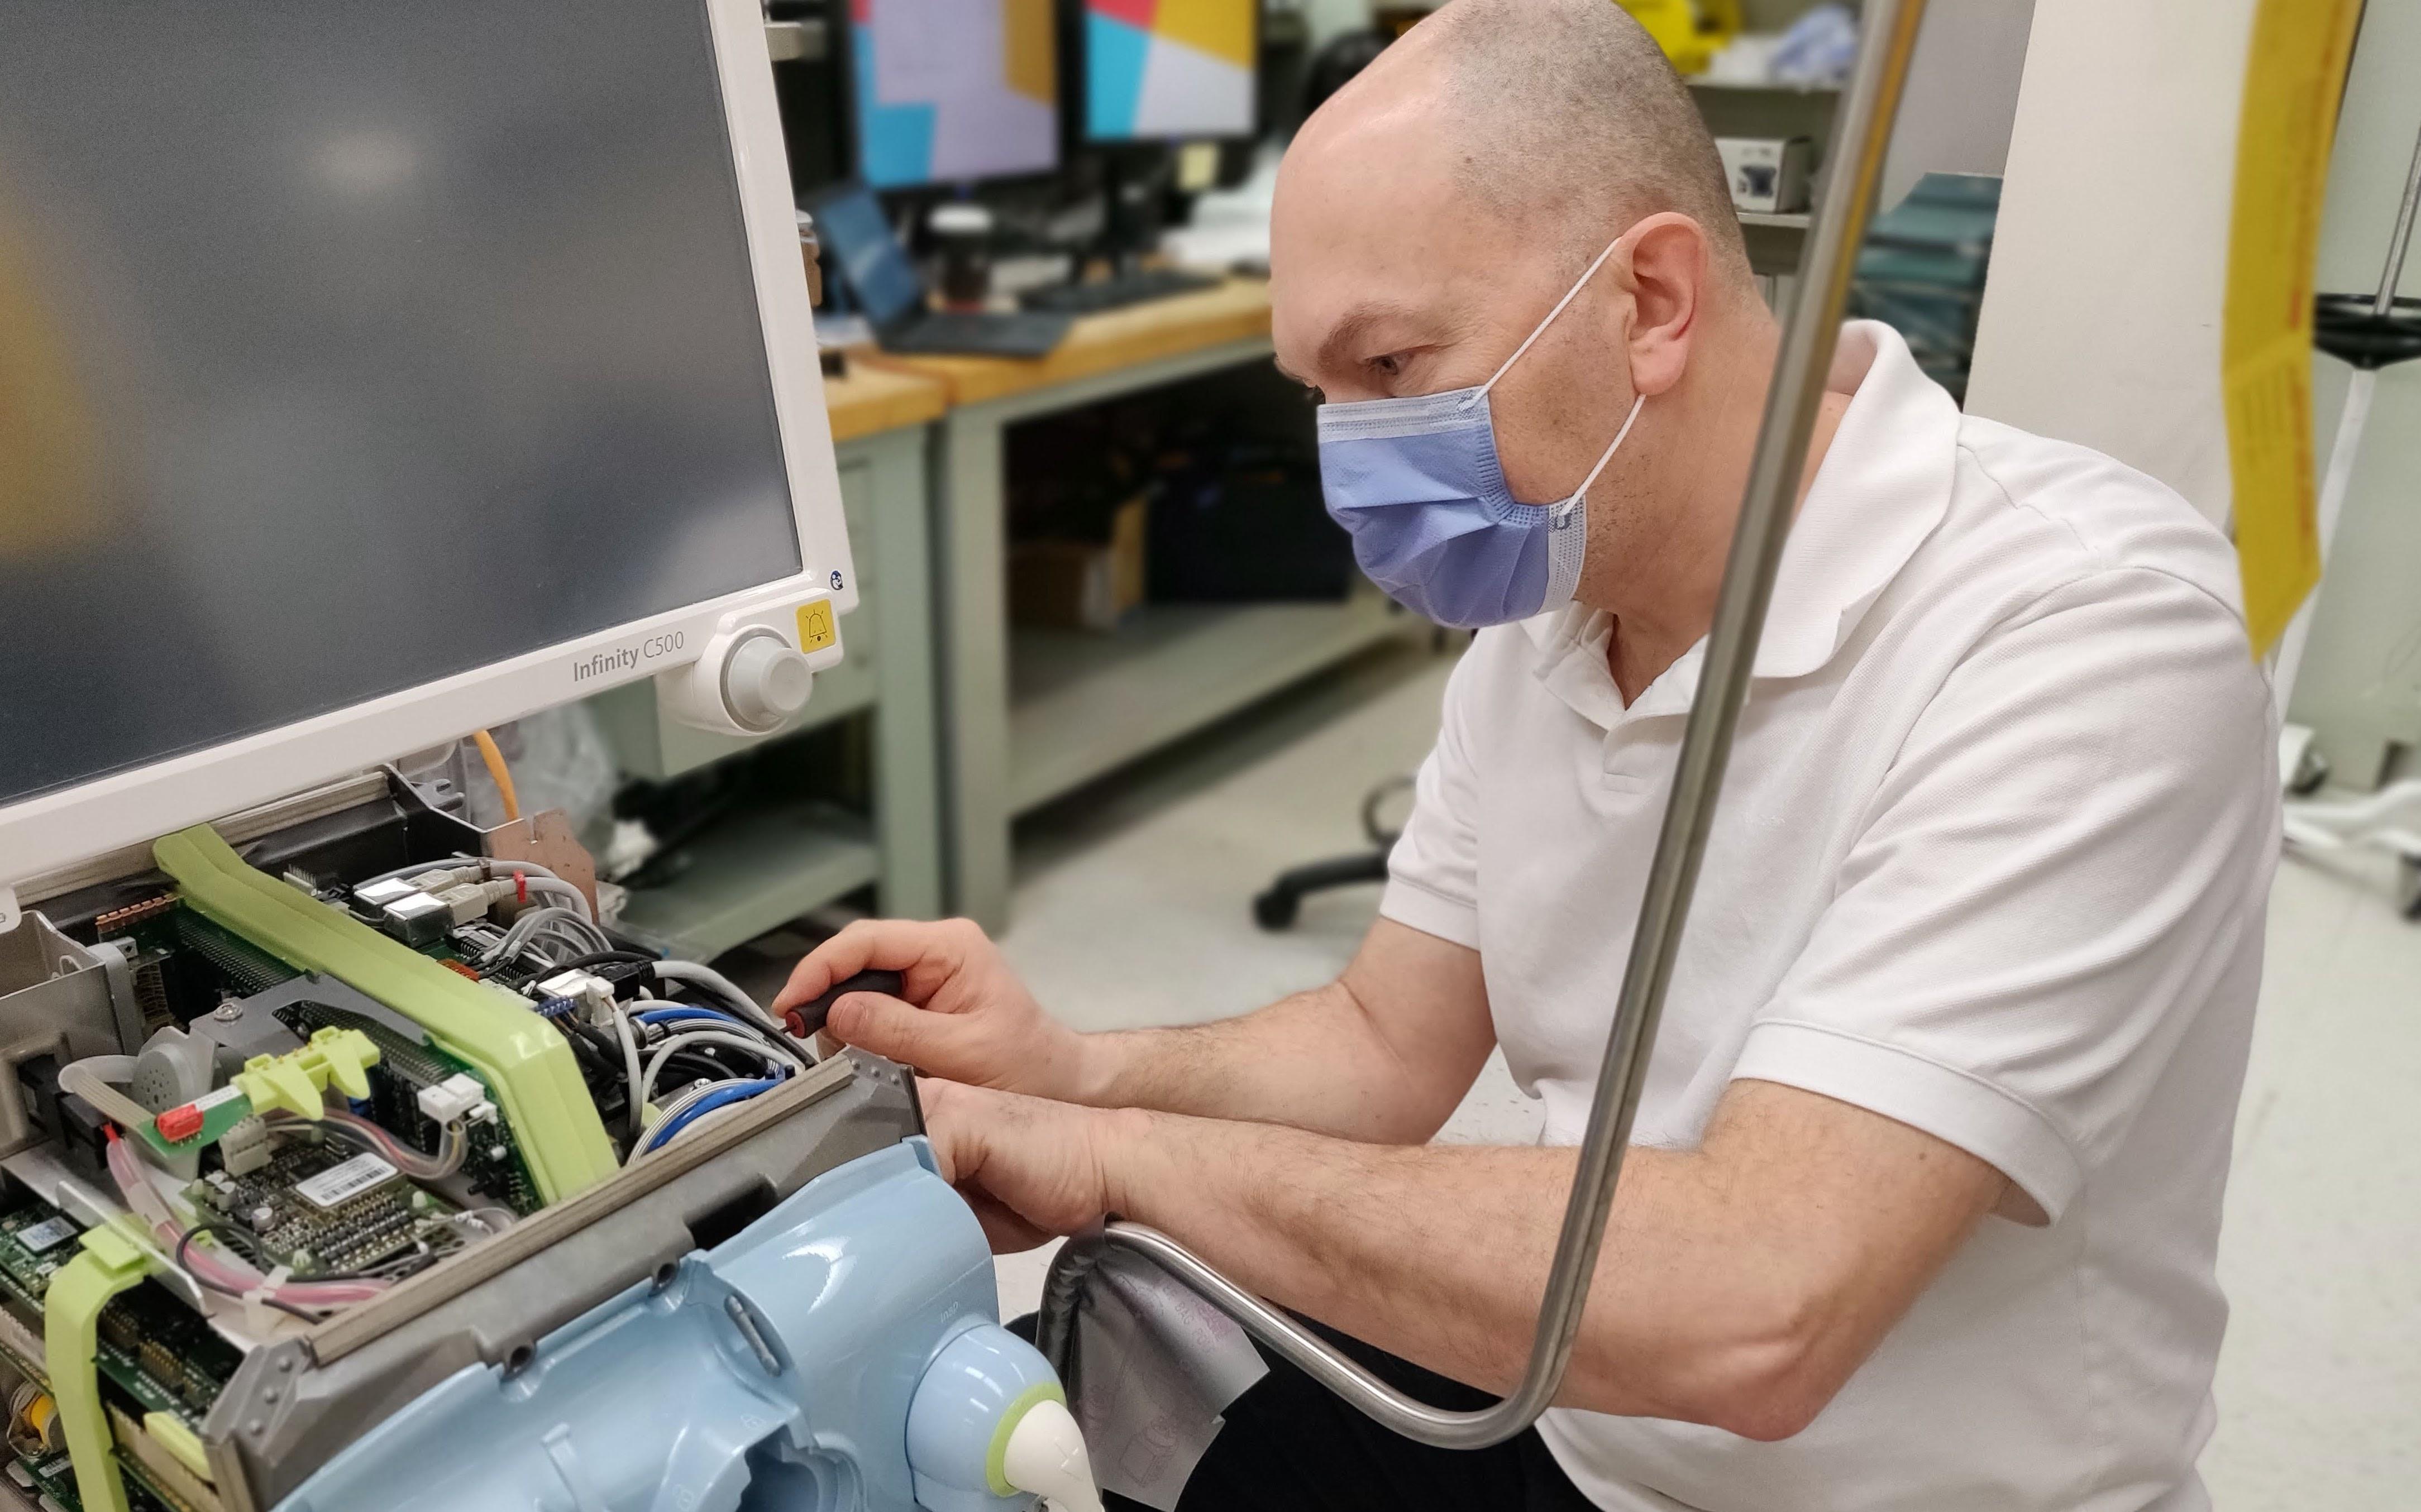 A man repairing a piece of medical equipment